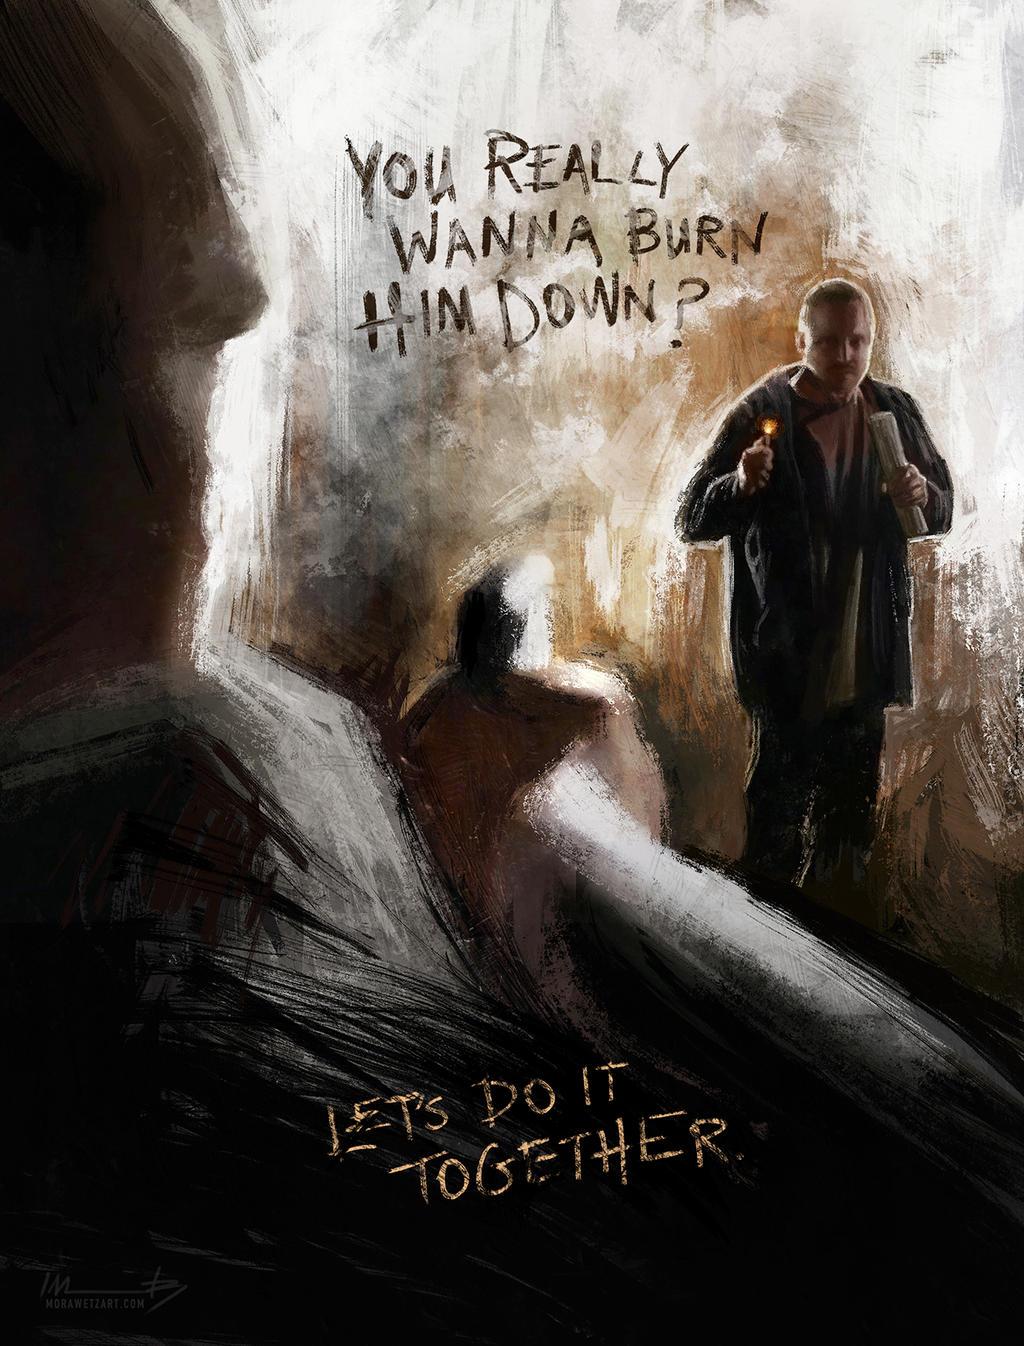 'You really wanna burn him down?' by imorawetz